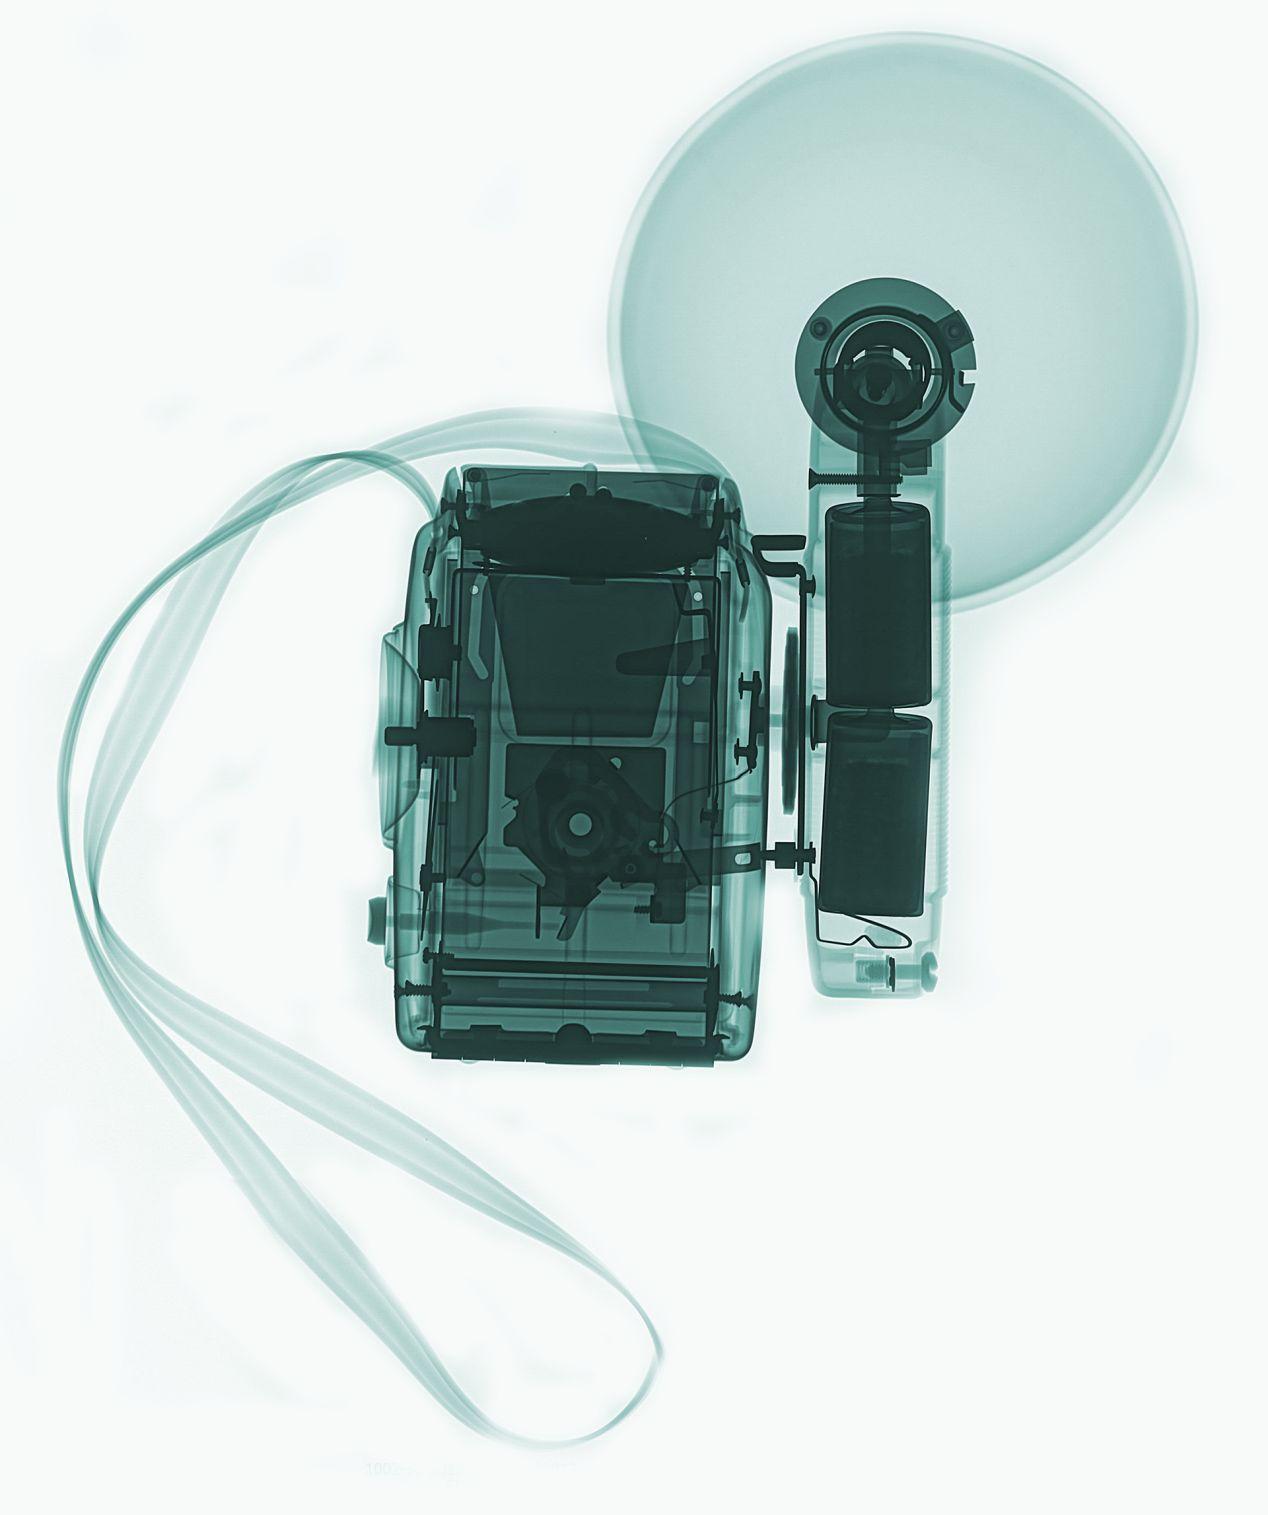 """X-ray Photography"" by Teresa Zgoda, source: Bēhance (CC)."